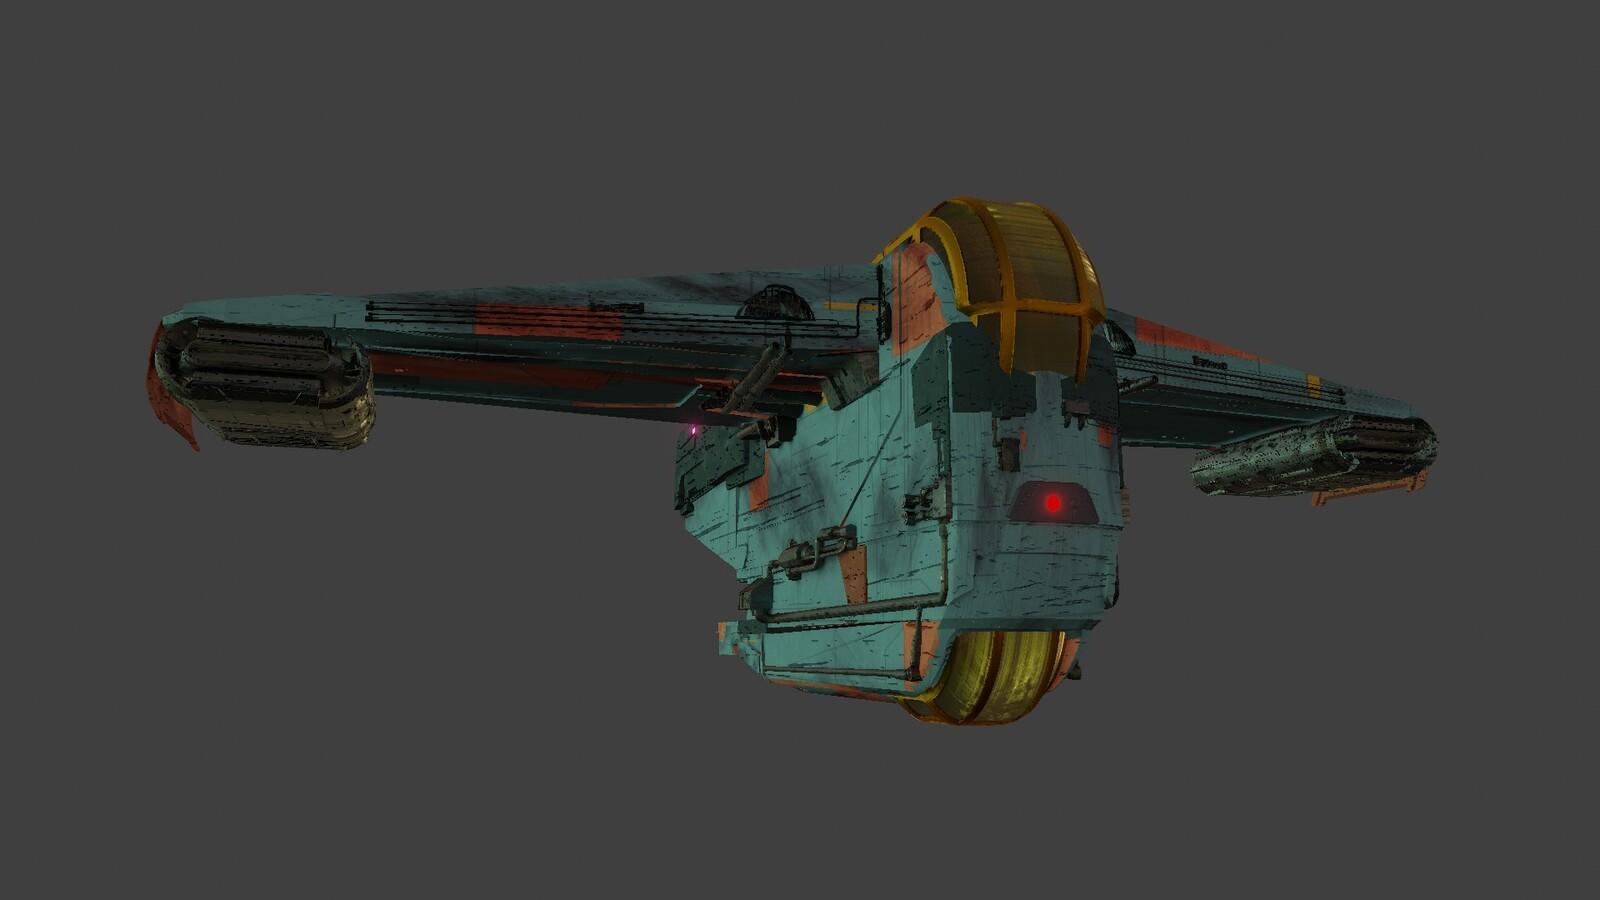 Blender texture of ship